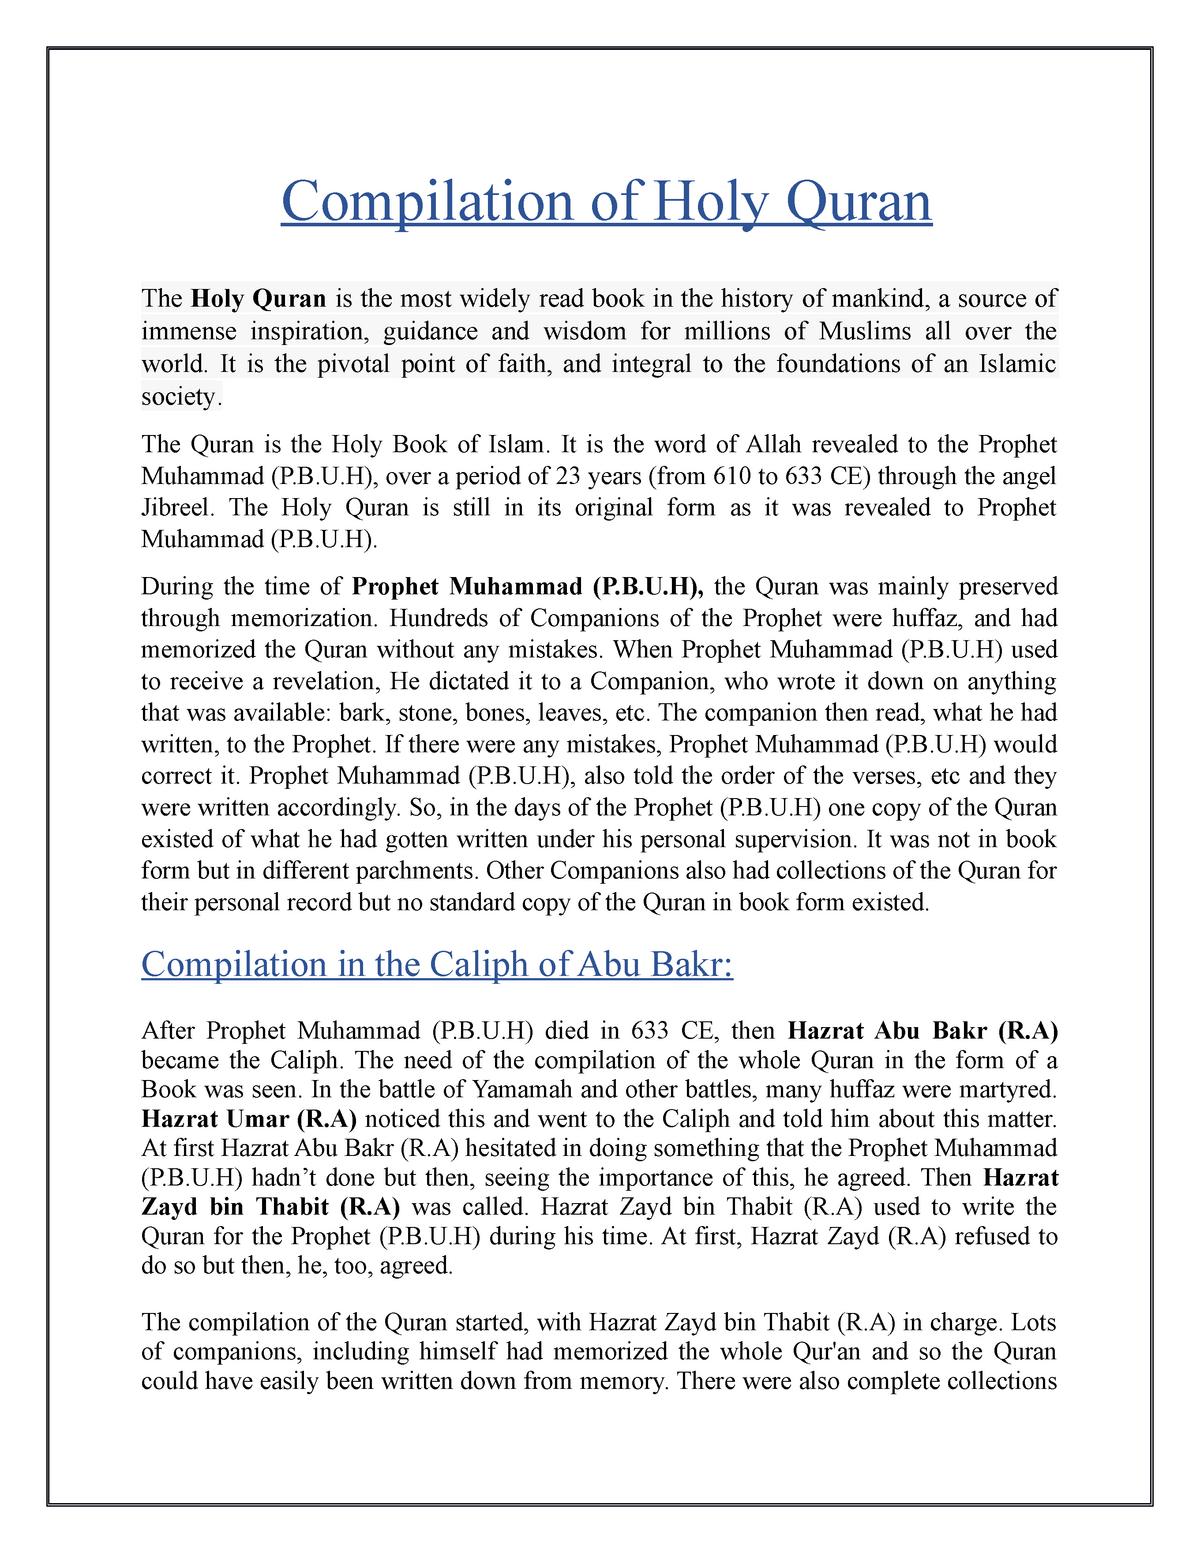 Compilation of Holy Quran - ISL - 2023 ISLAMIC STUDIES - StuDocu